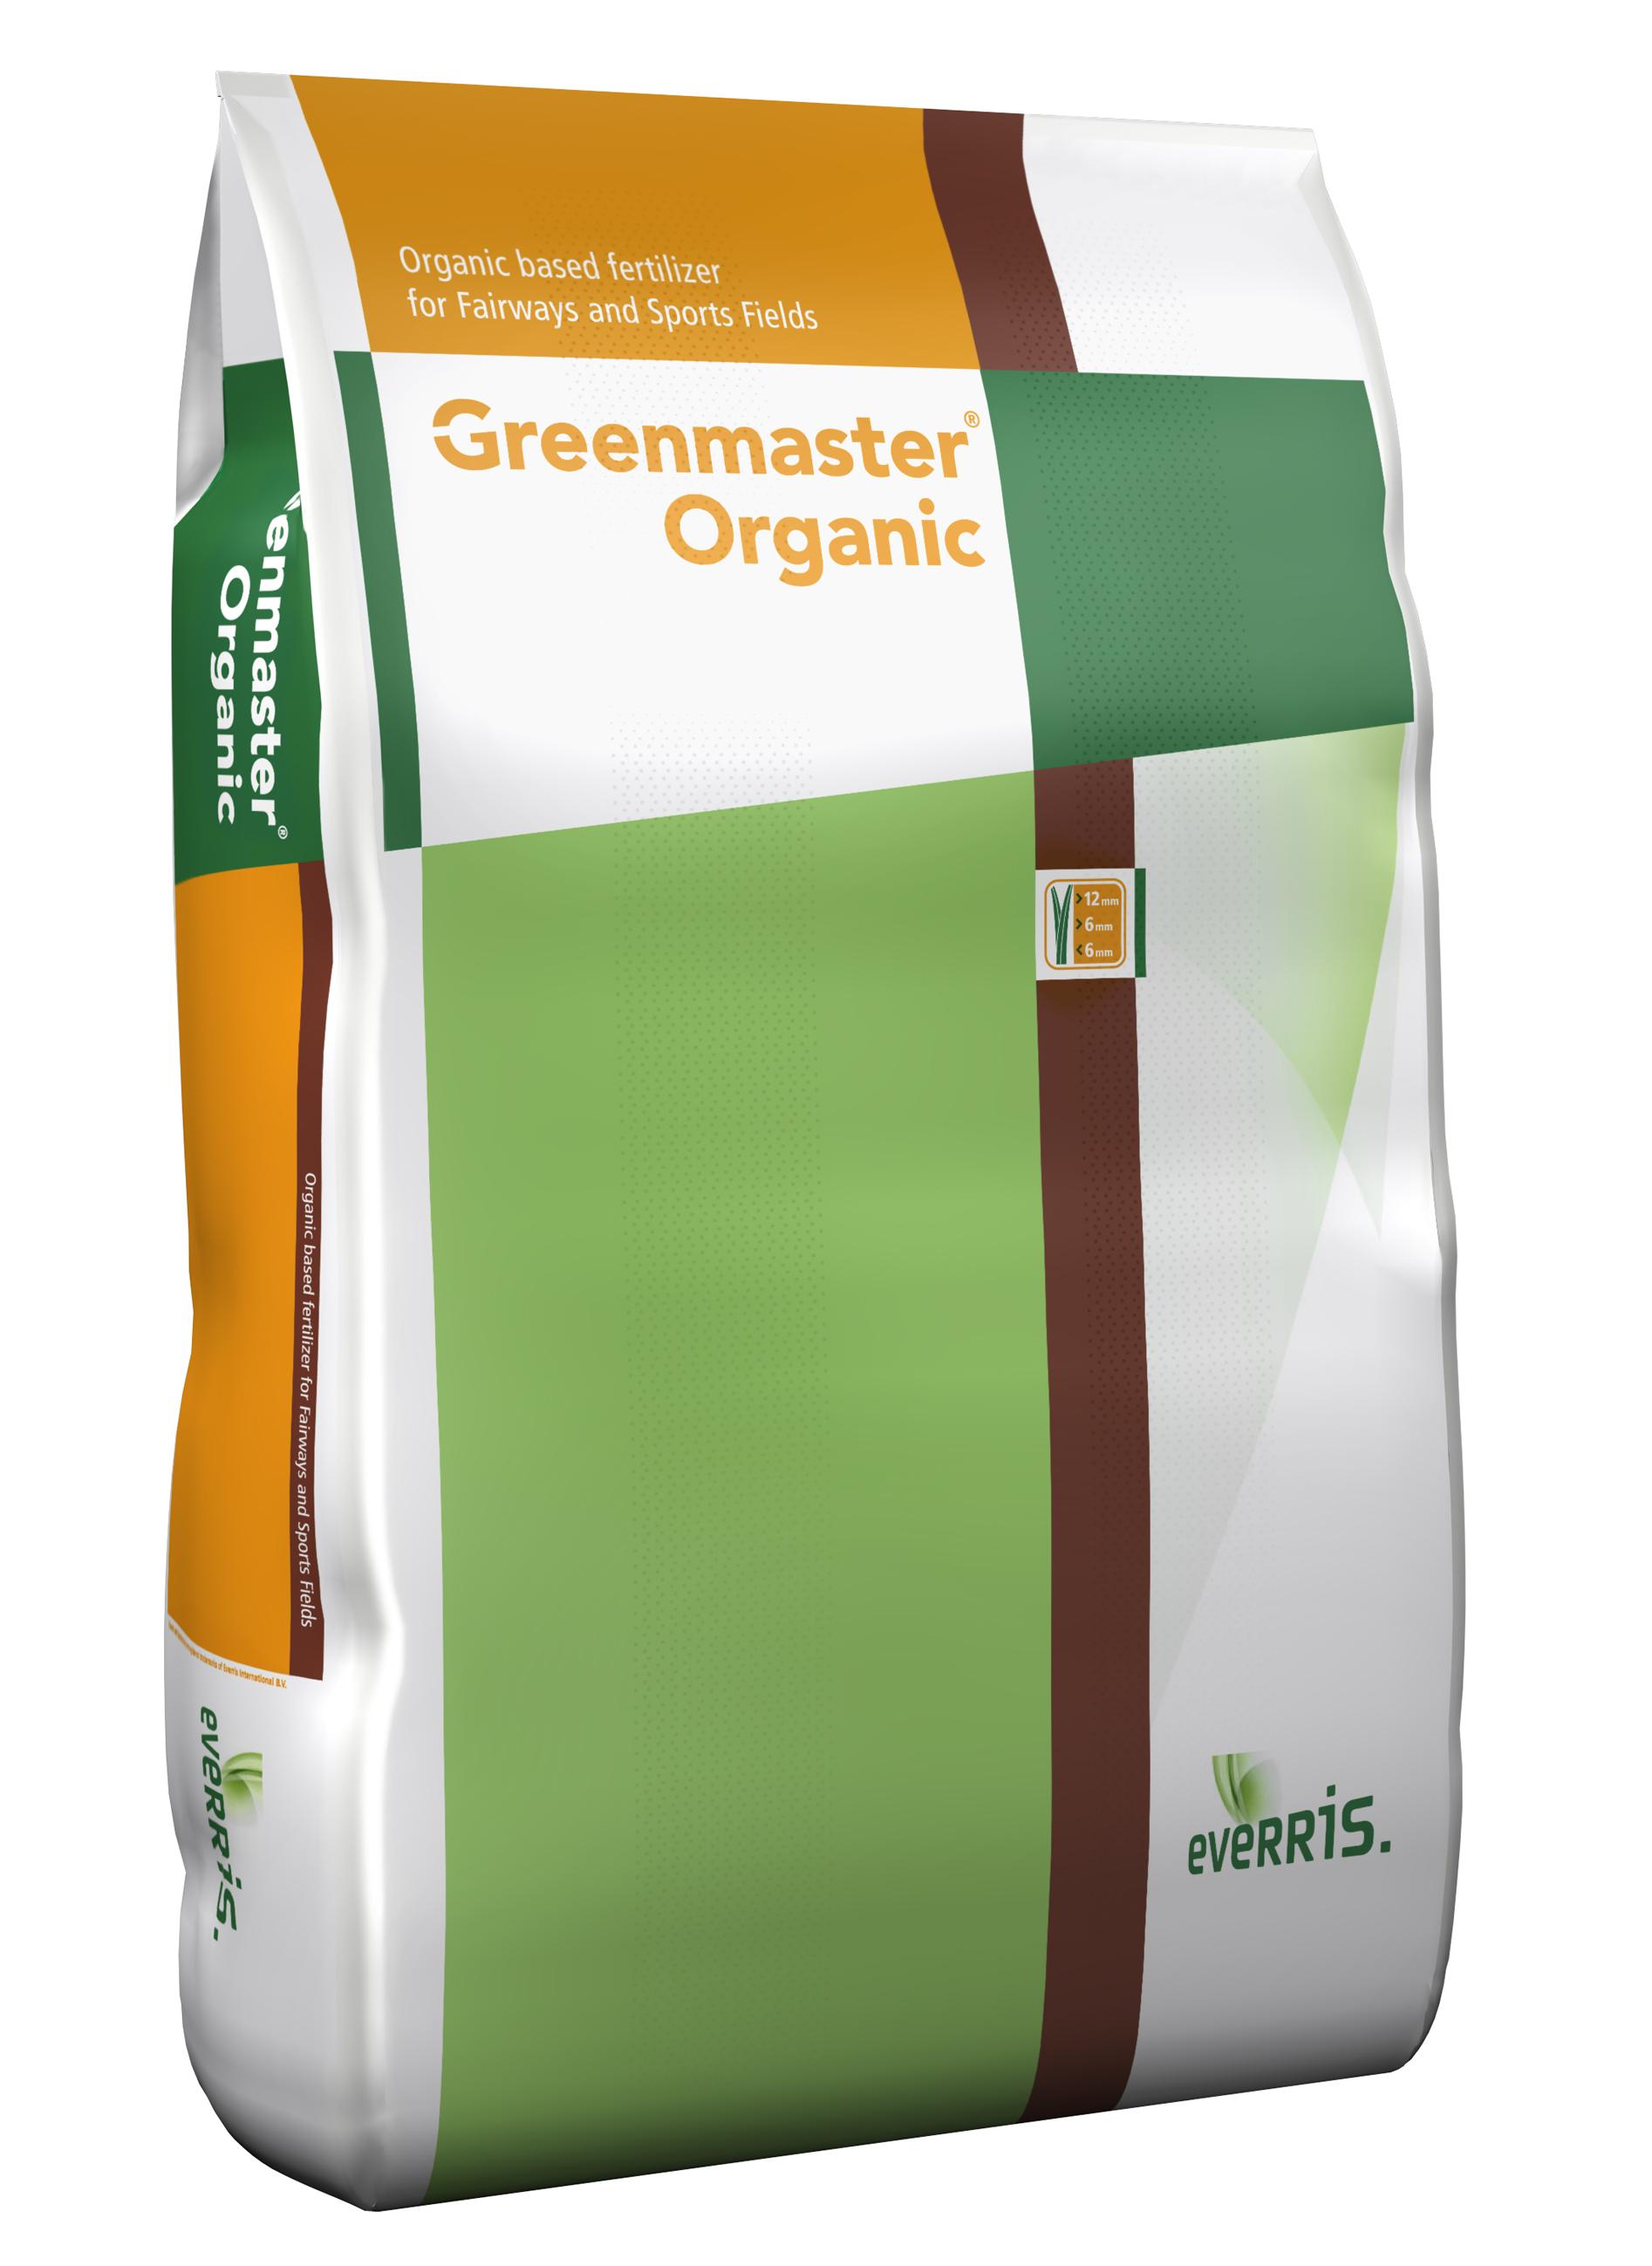 Greenmaster Organic High N